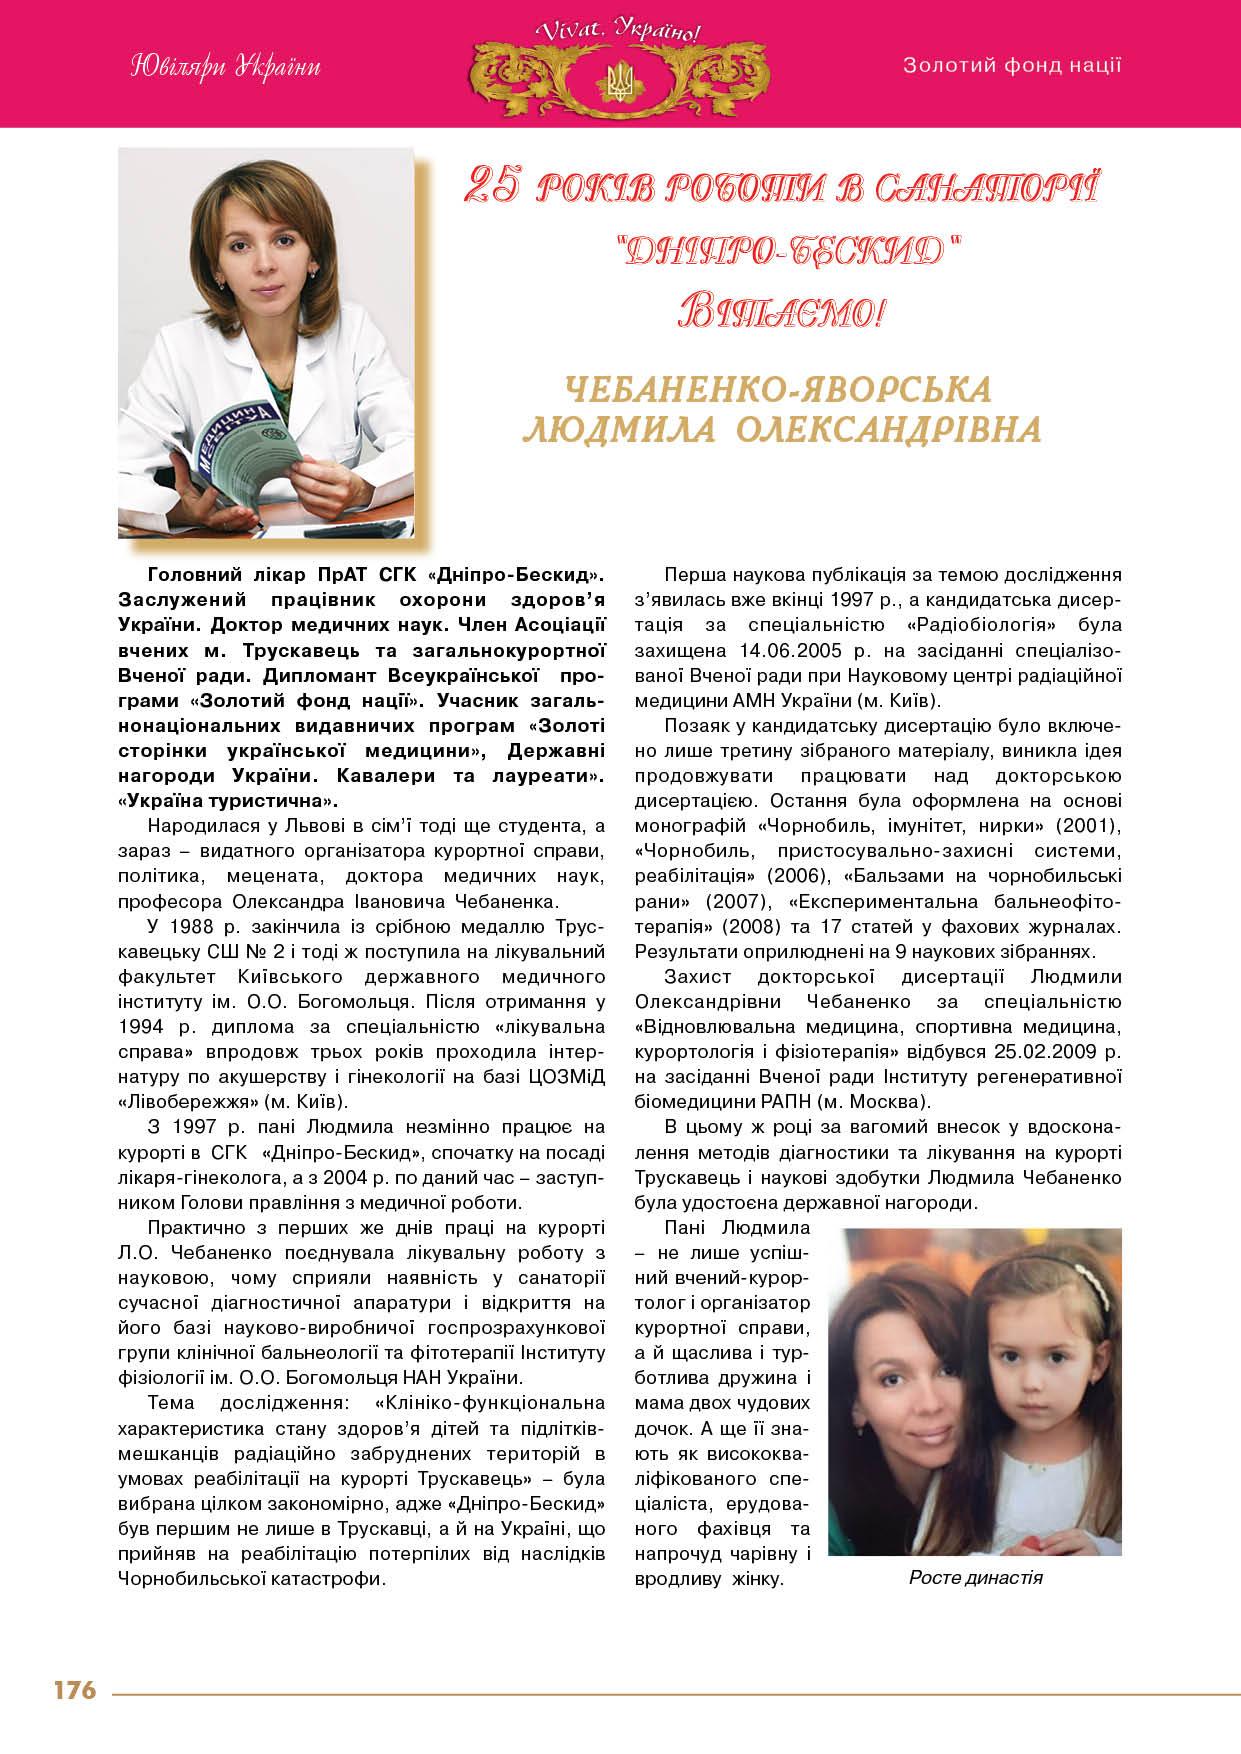 Чебаненко-Яворська Людмила Олександрівна